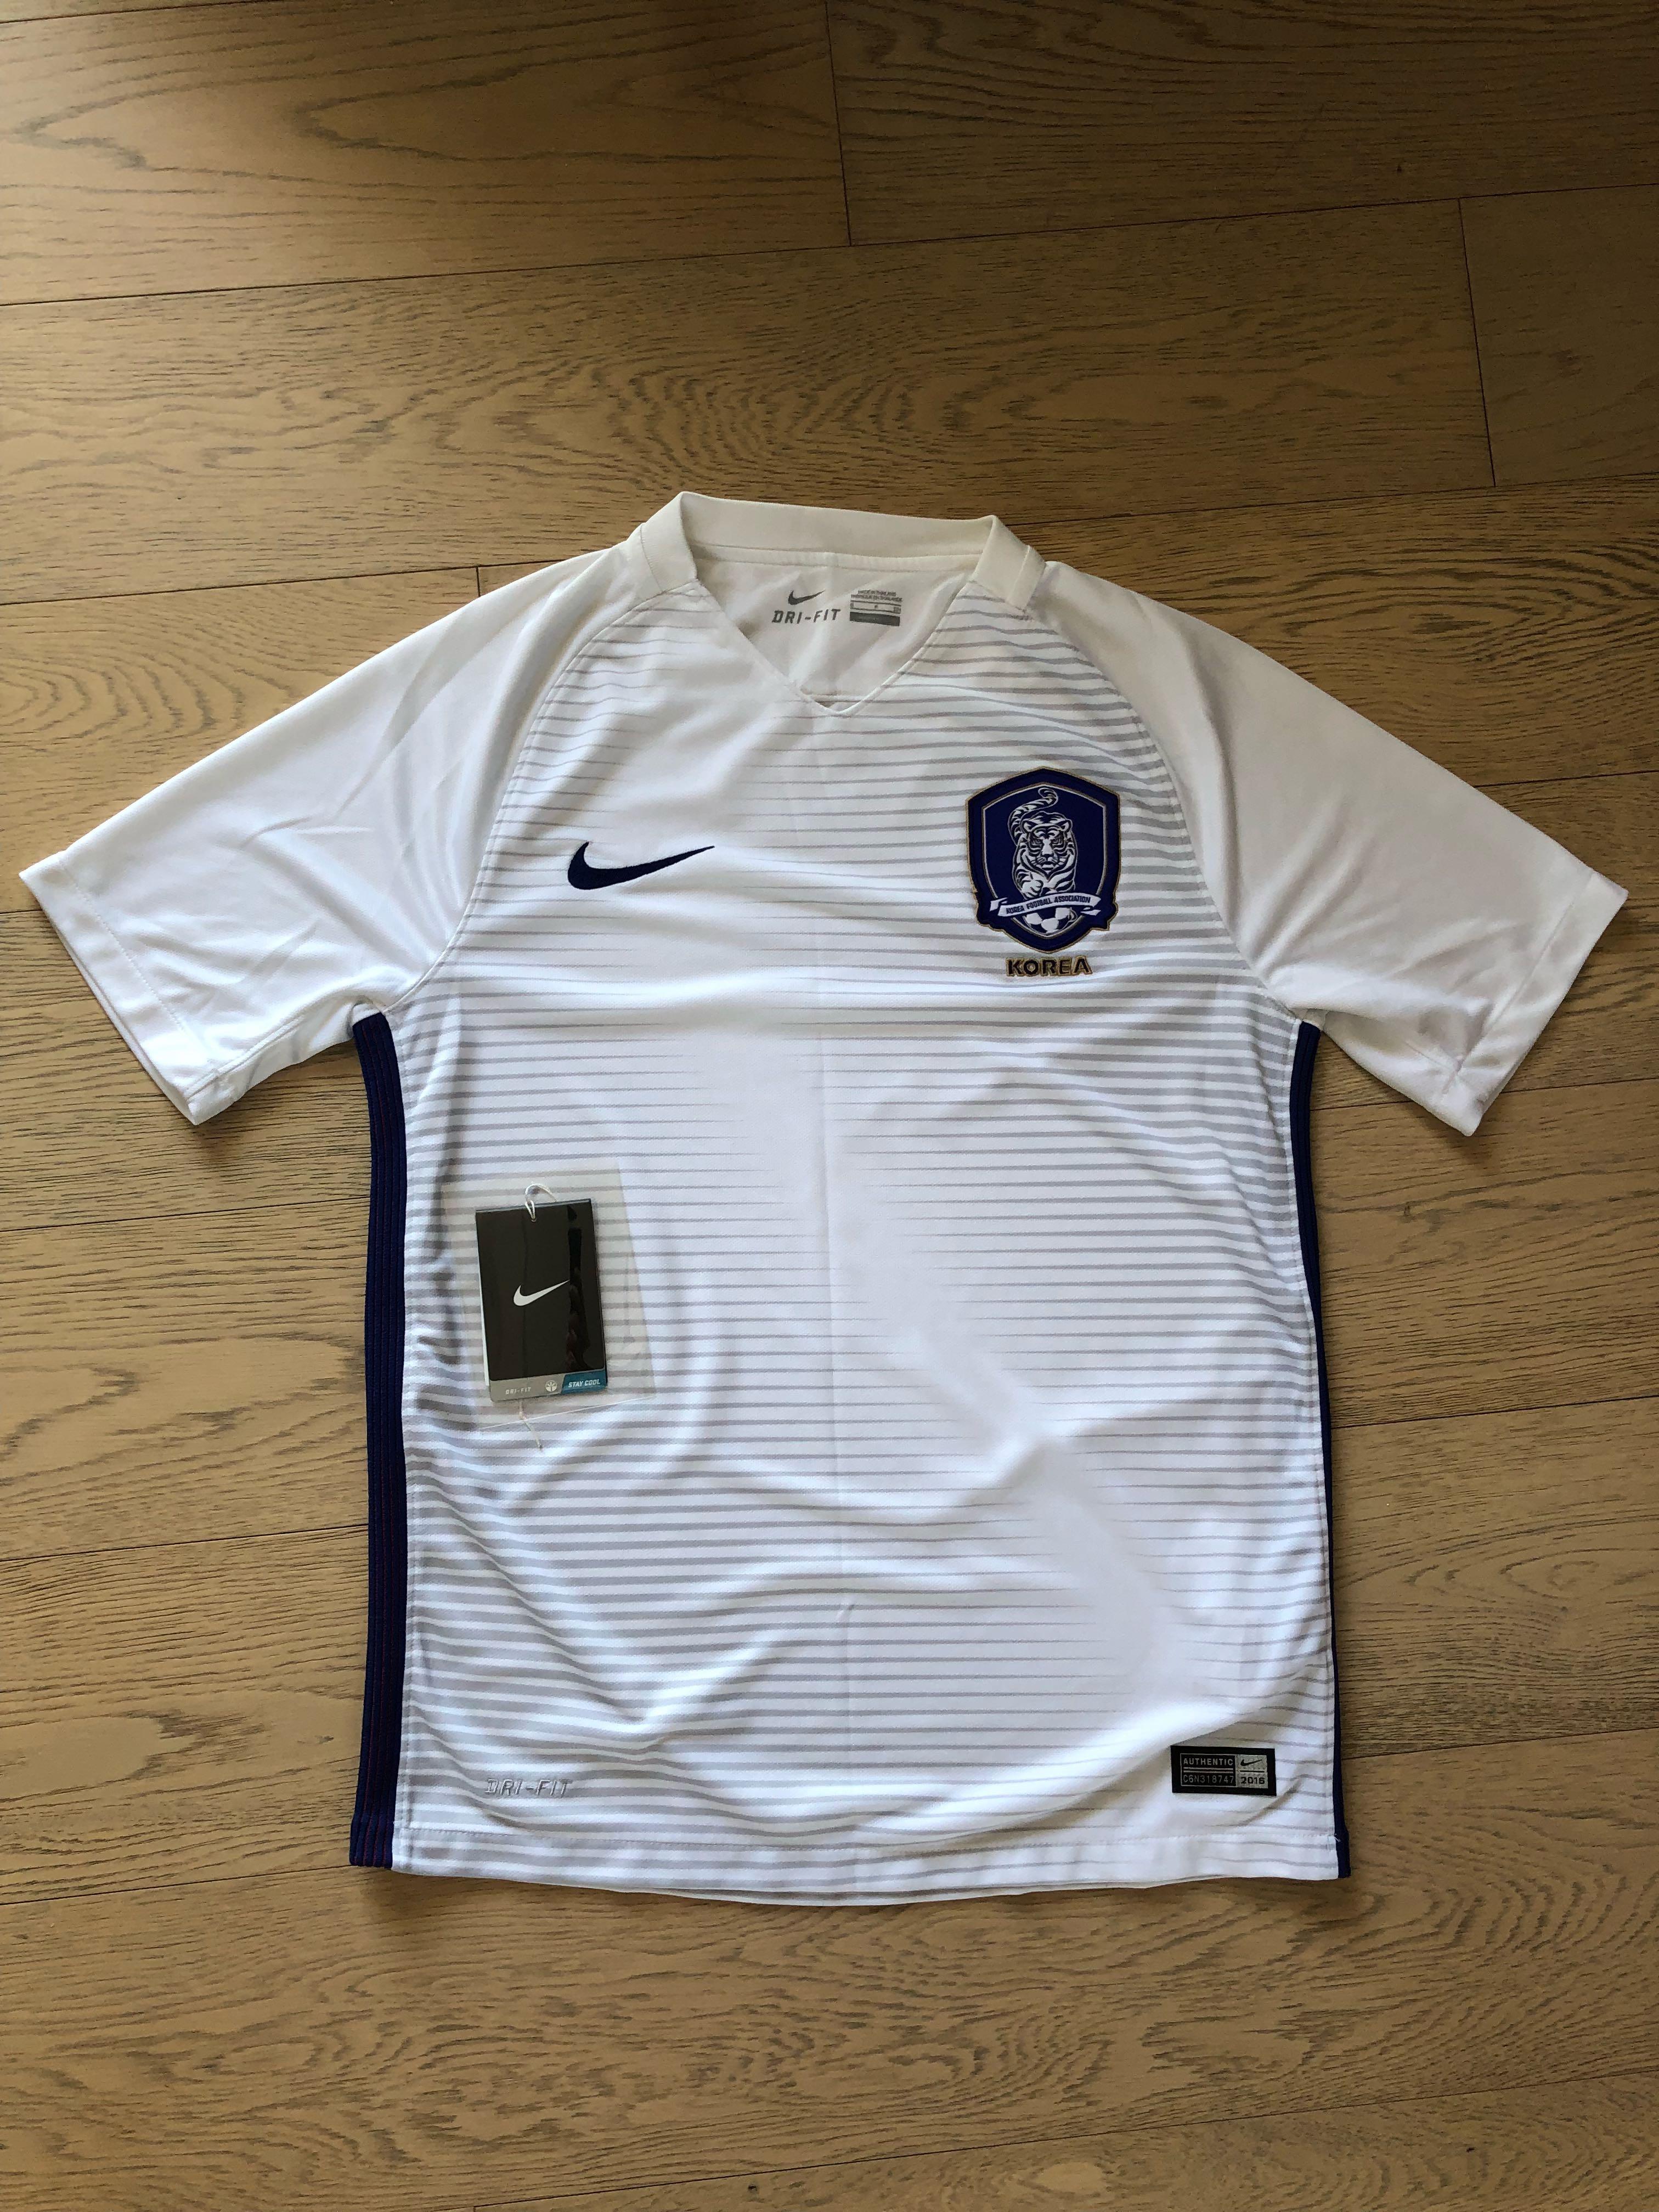 902037b1a Nike Soccer South Korea National Team Jersey